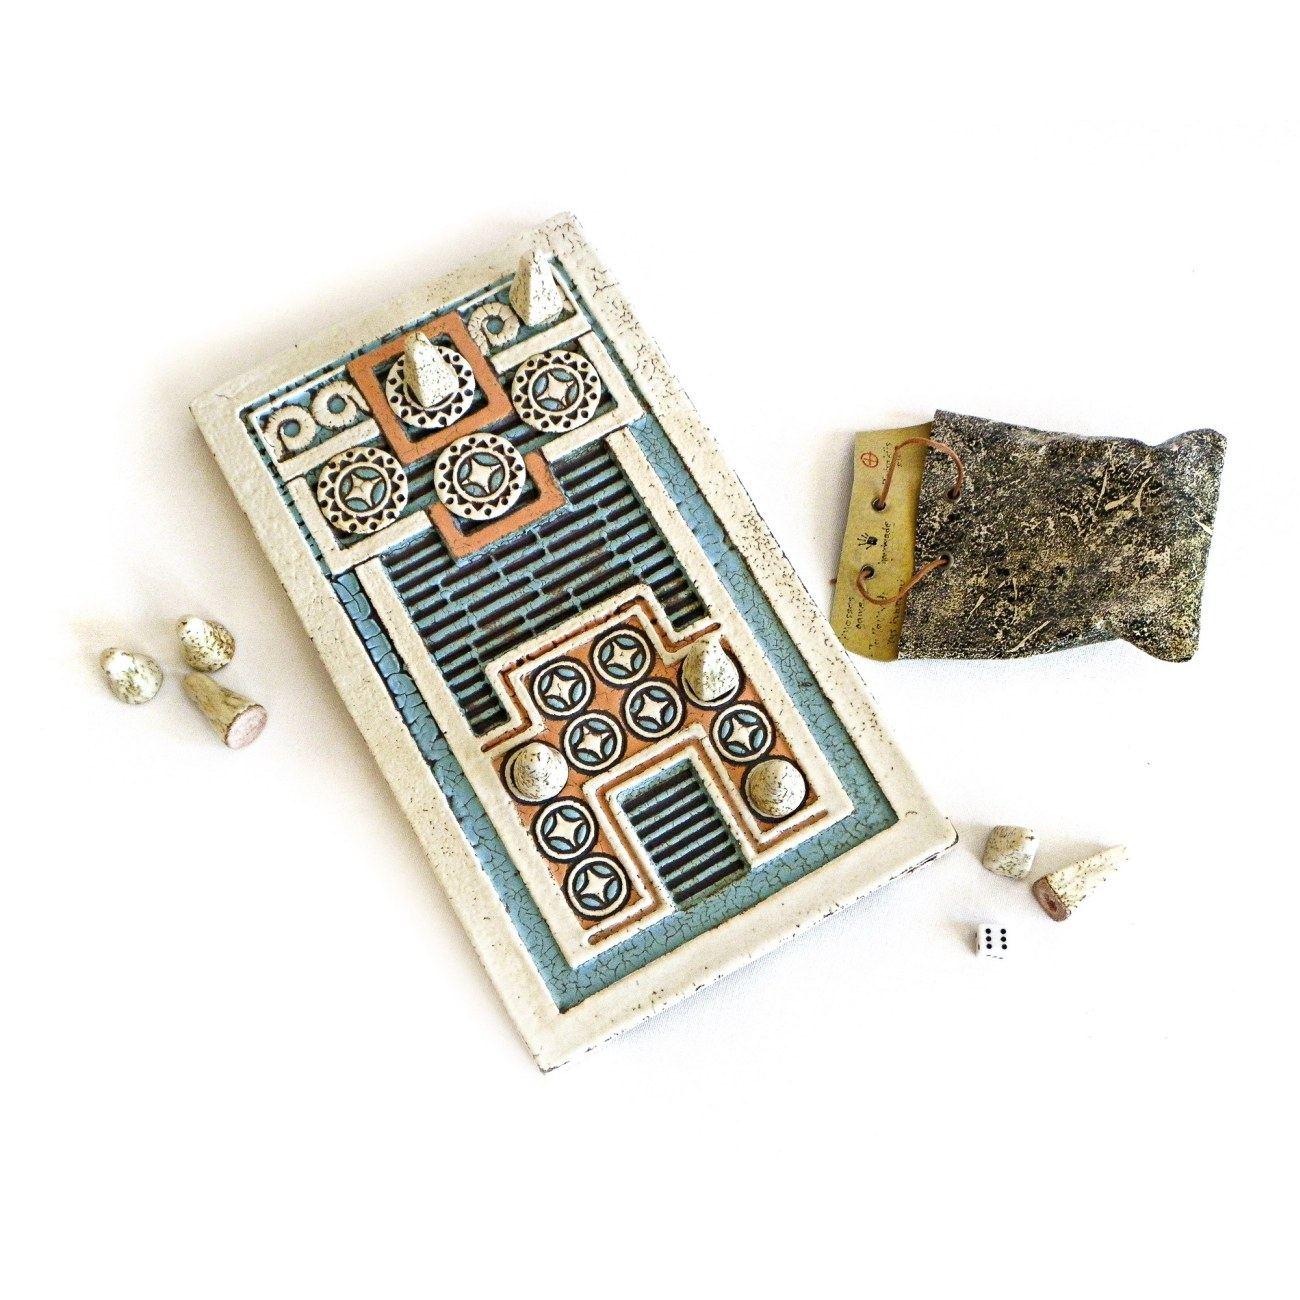 Decorative Product Board : Knossos decorative board game handmade ceramic ancient